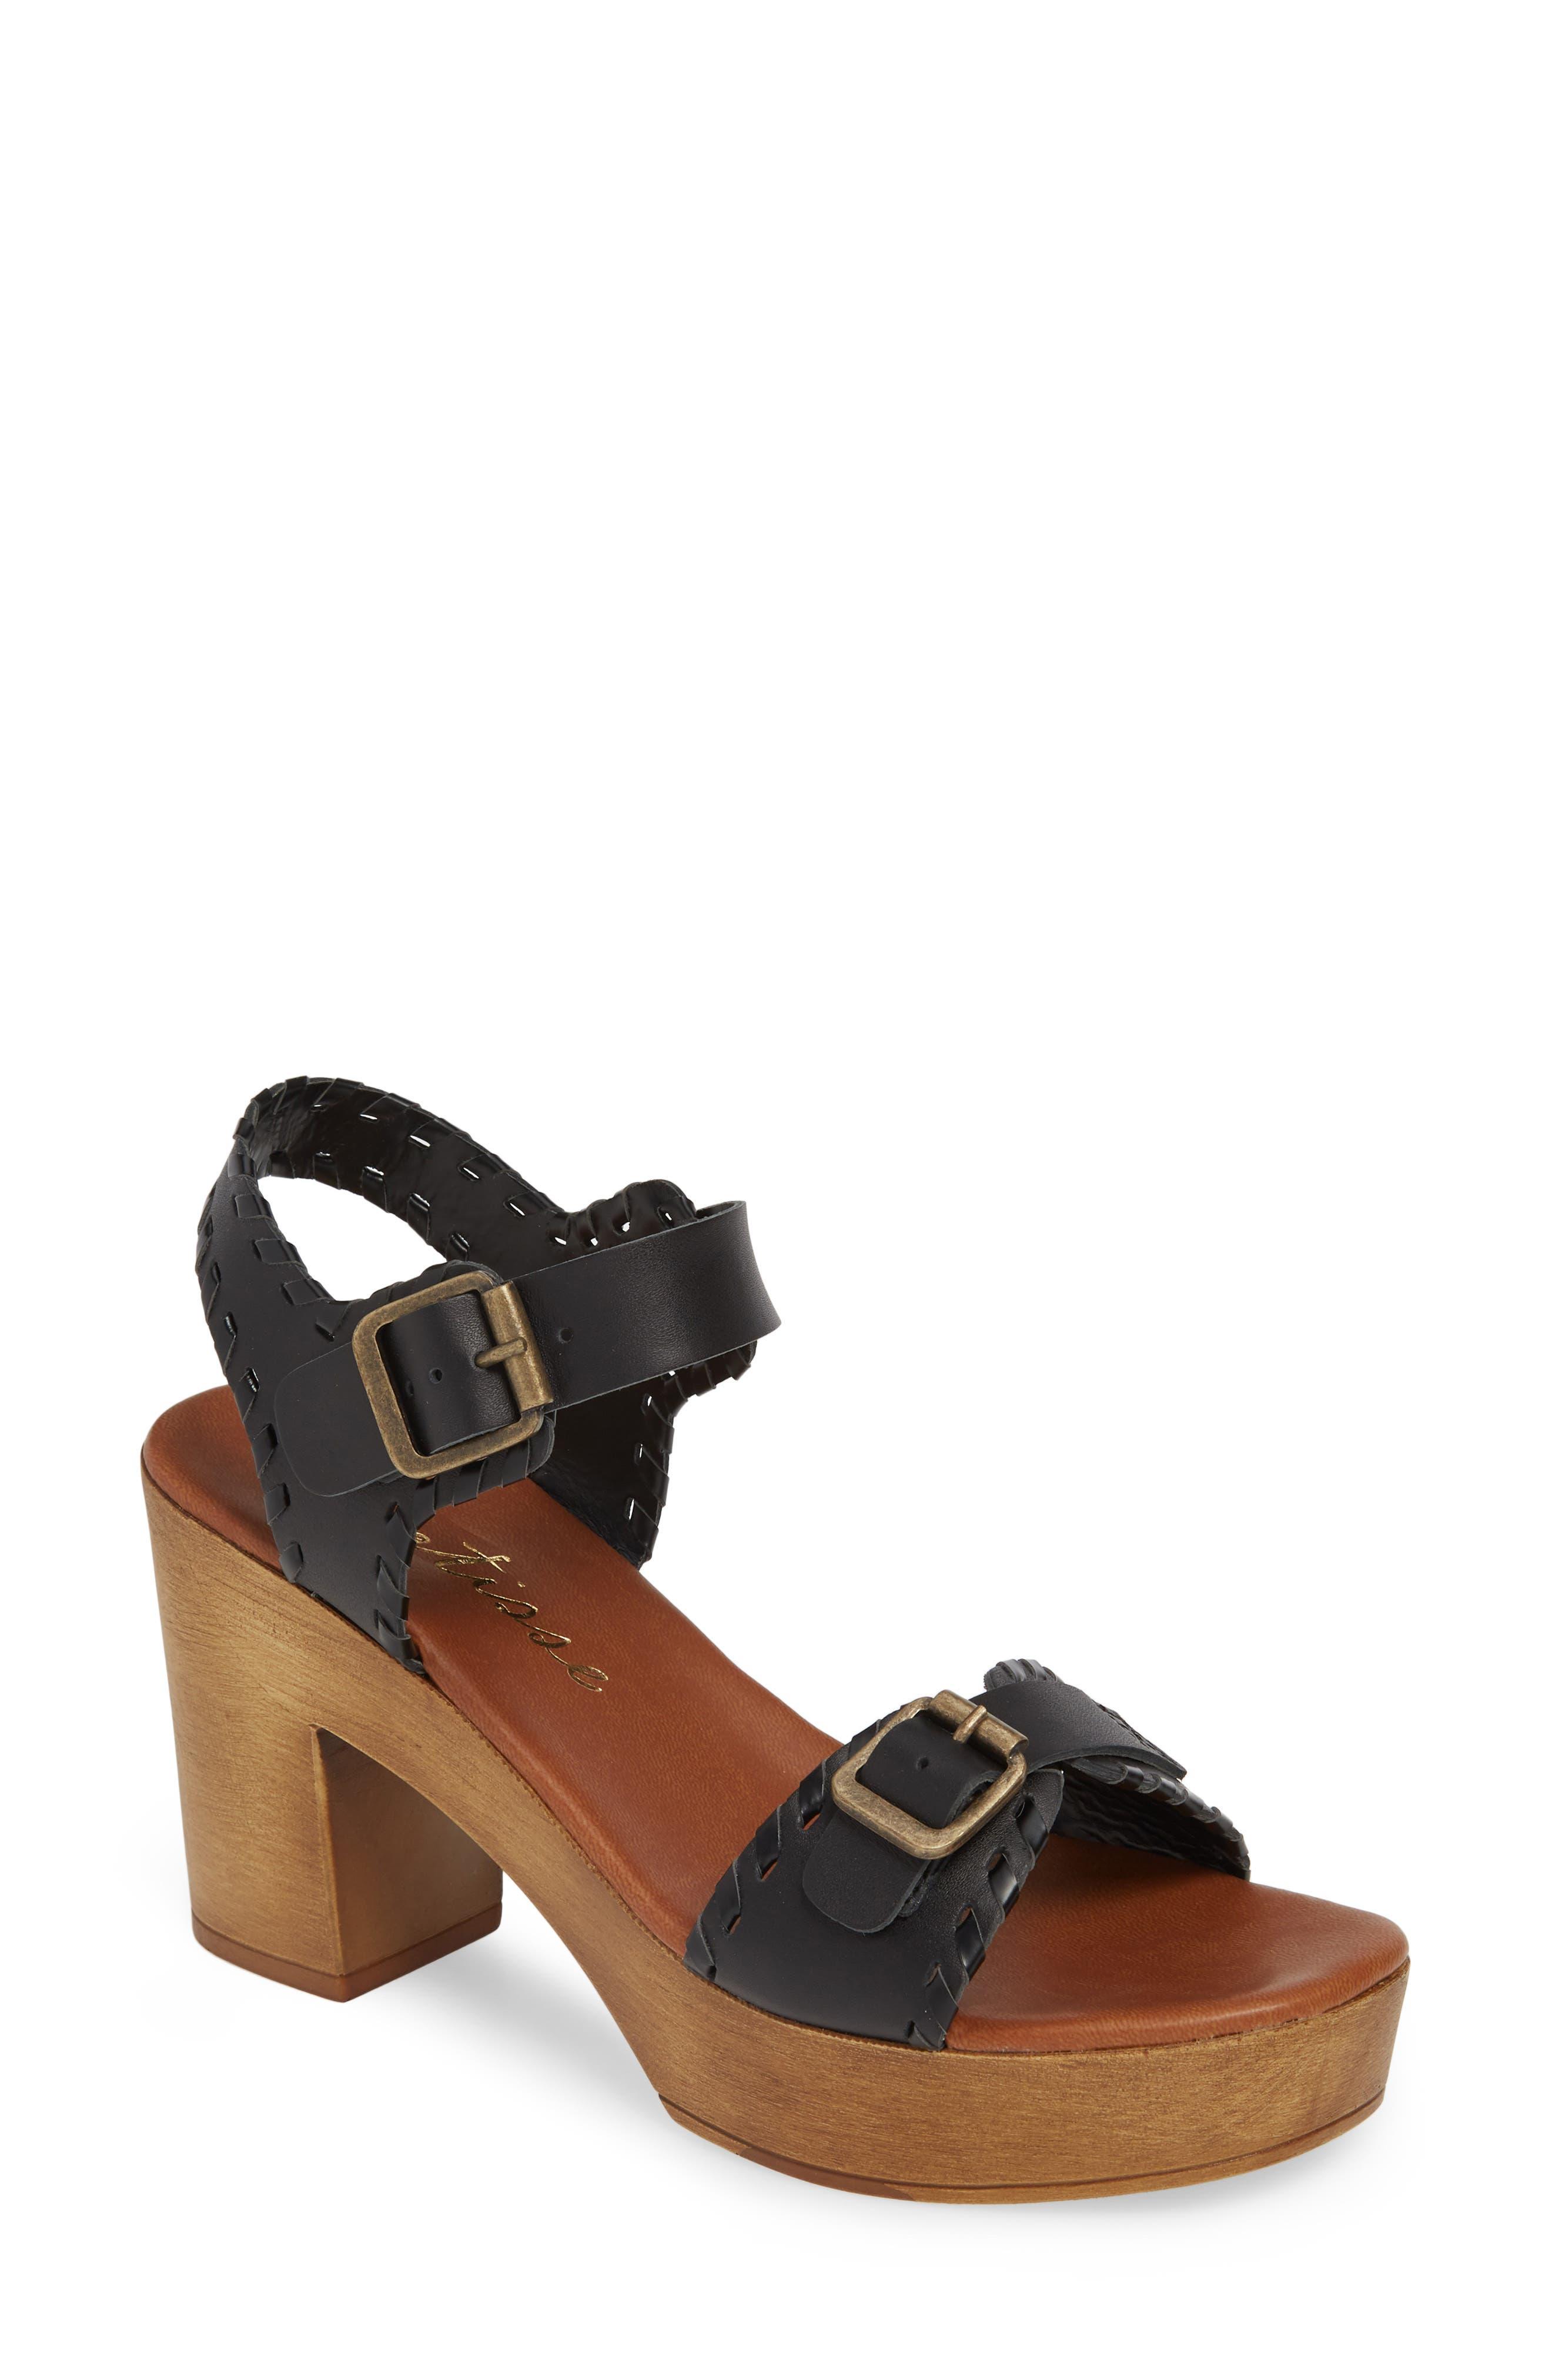 Matisse Twiggy Platform Sandal, Black